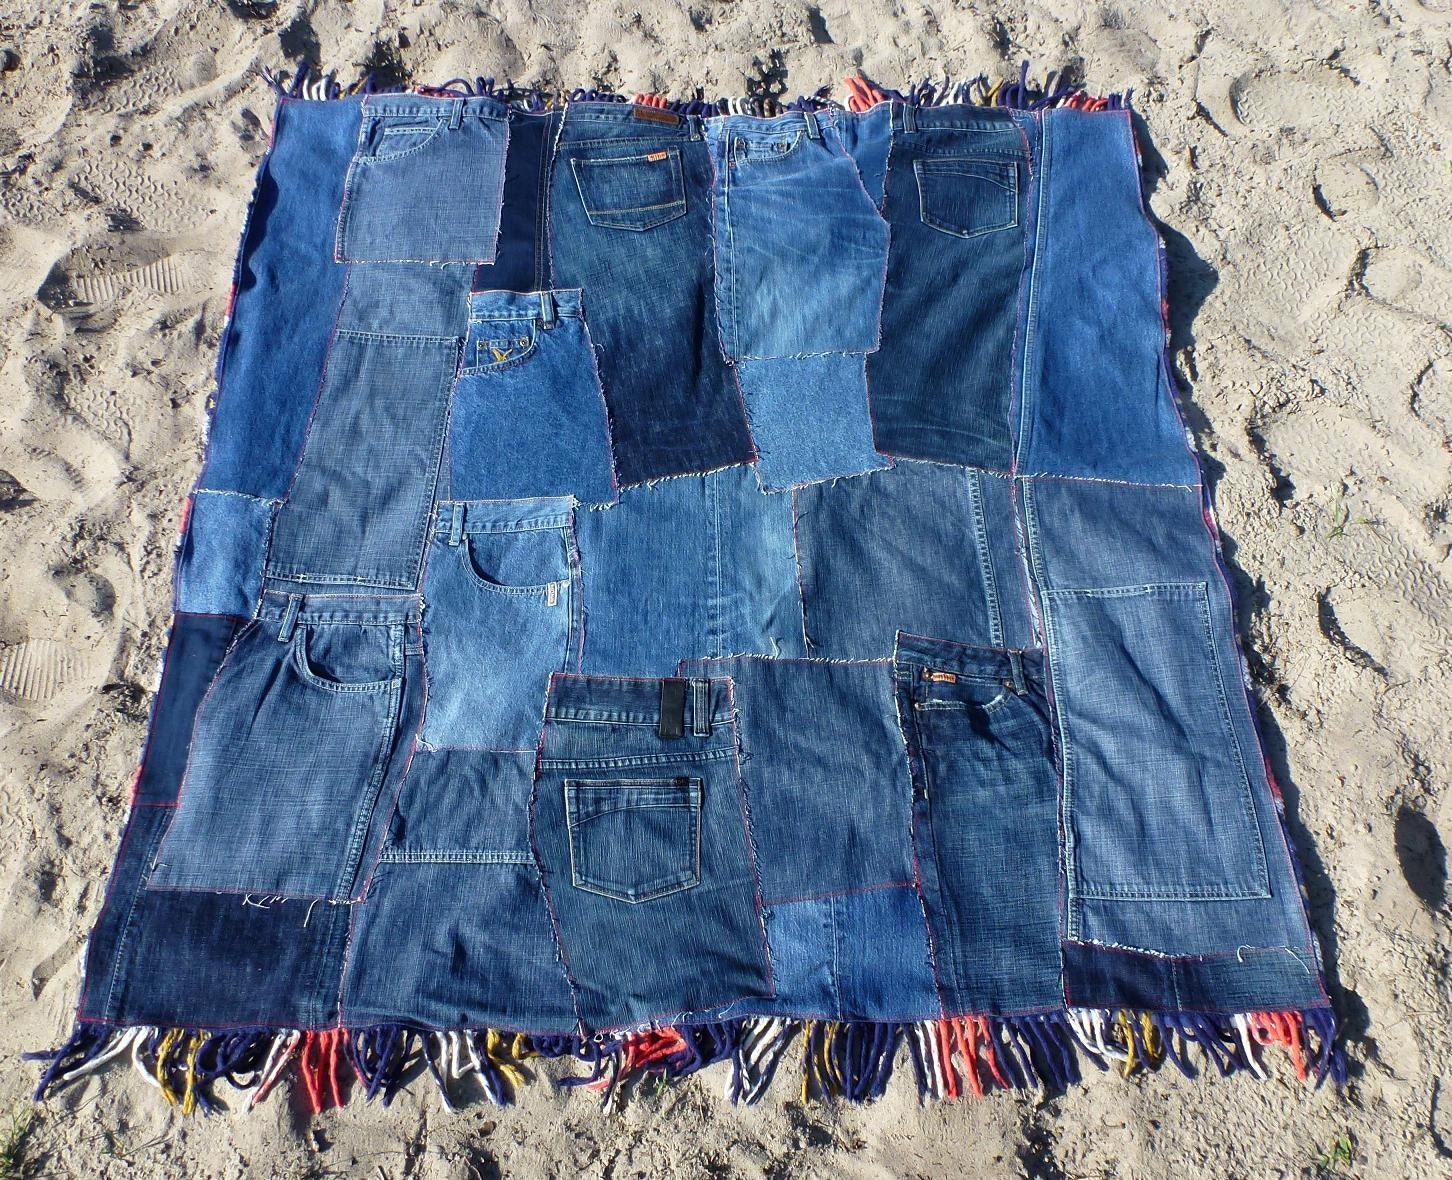 Patchwork Denim Quilt Plaid Picnic Blanket With Fringe Eco